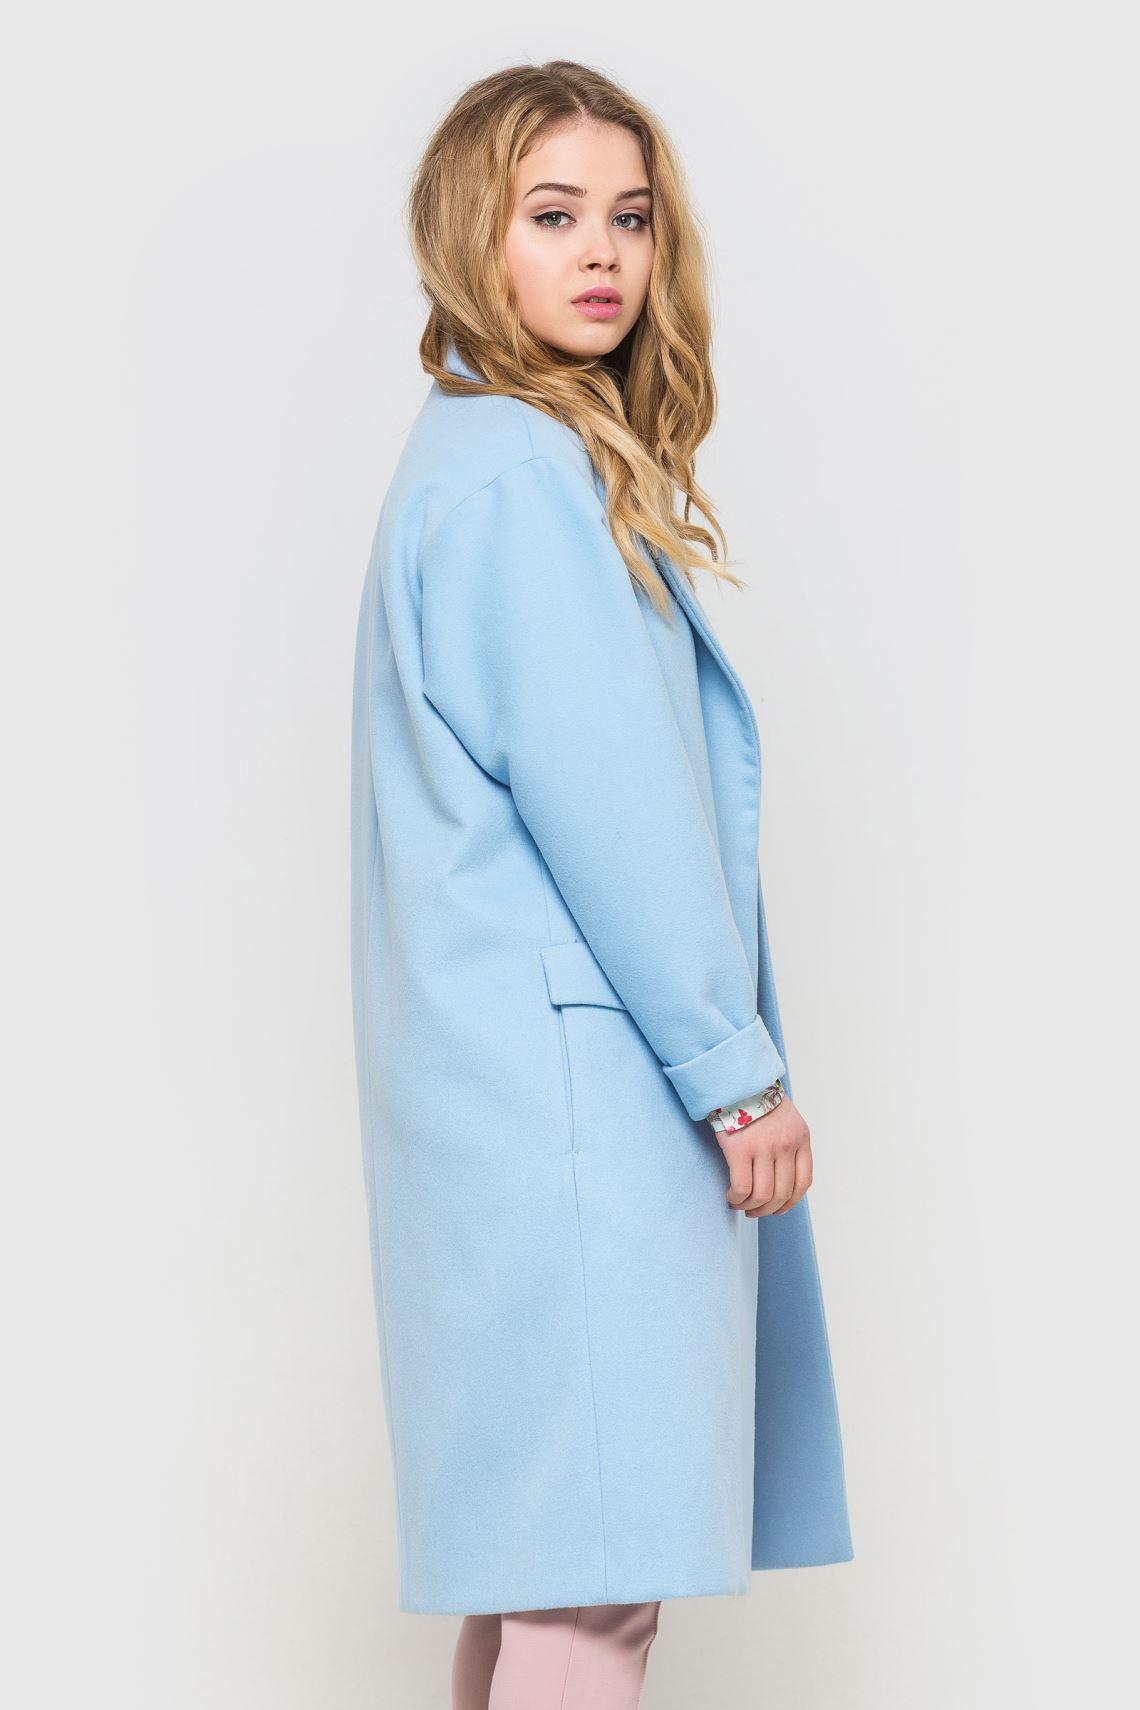 Пальто жіноче блакитне зі спущеним плечем  1ef8ef72b95ae